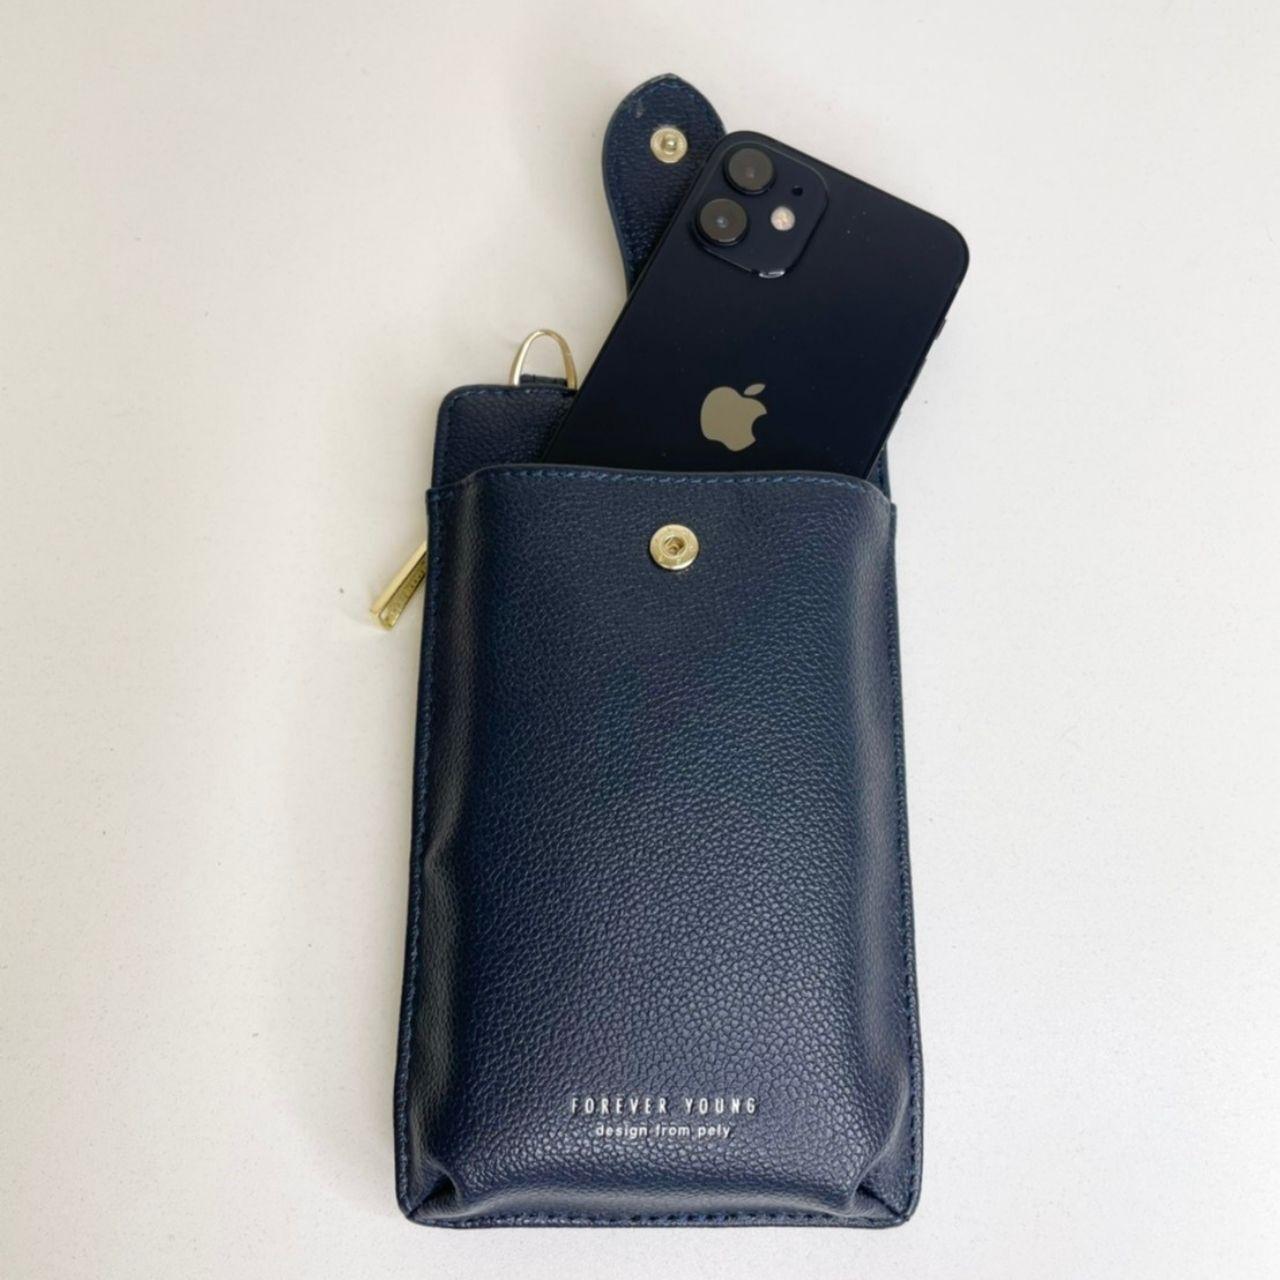 ymda 043upk3 スマホバッグ 紺 スマホケース スマホポーチ 手帳型 ケース iPhone スマートフォン カード入れ